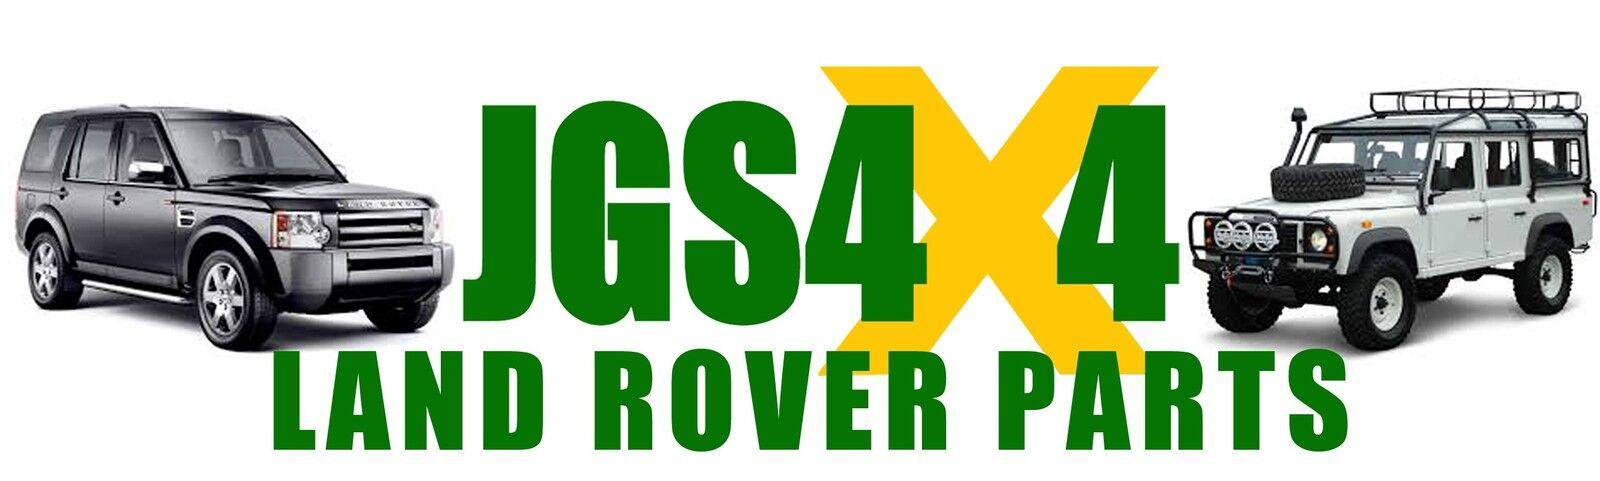 JGS 4x4 Land Rover Parts